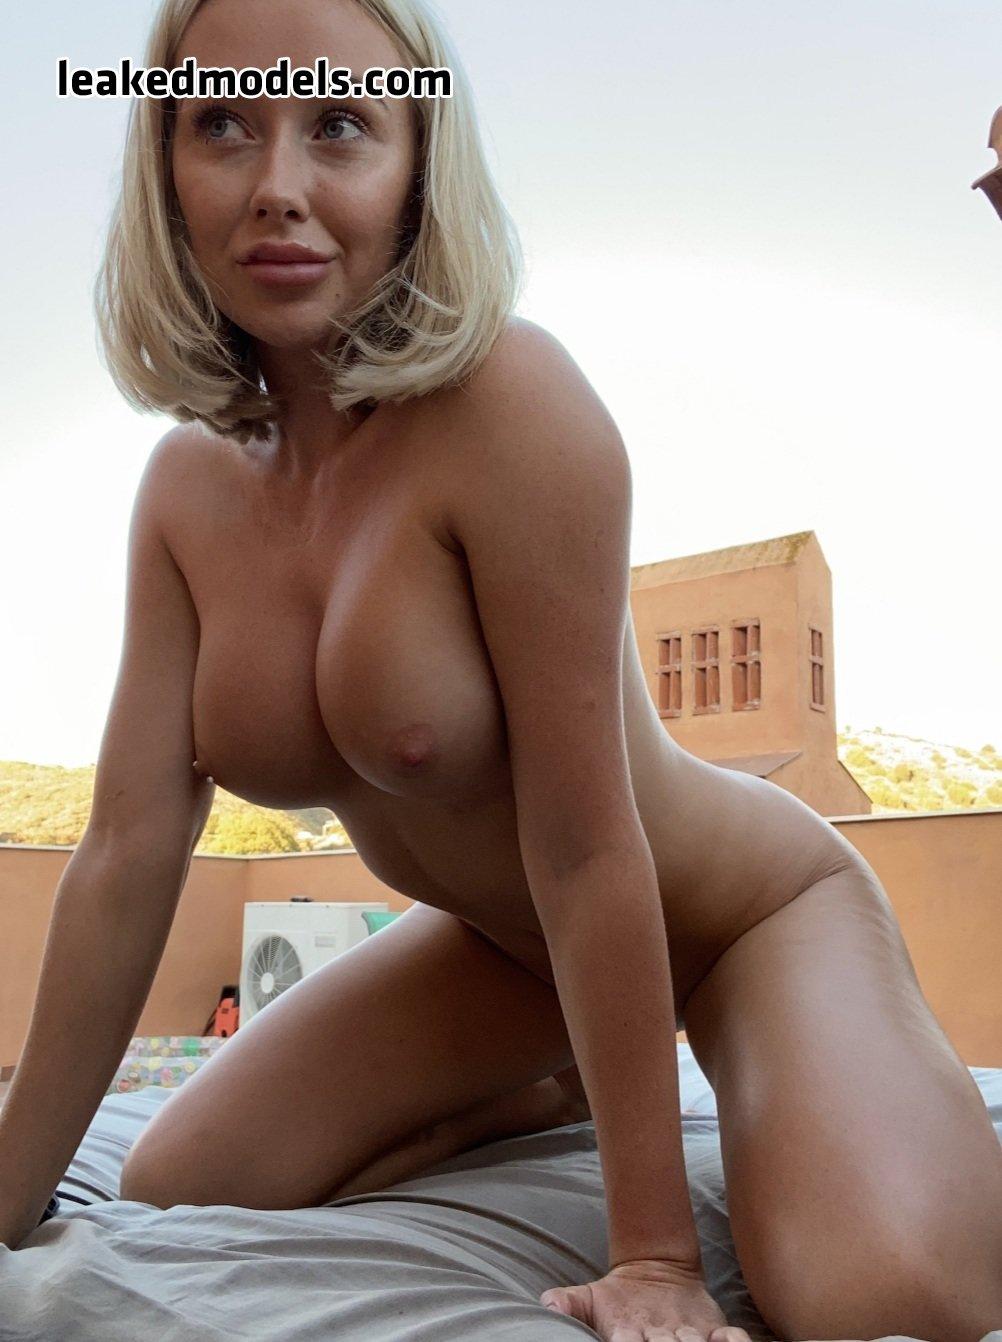 ge0rgia cr0ne leaked nude leakedmodels.com 0046 - Georgia Crone – Ge0rgia Cr0ne AdmireMe Nude Leaks (50 Photos)